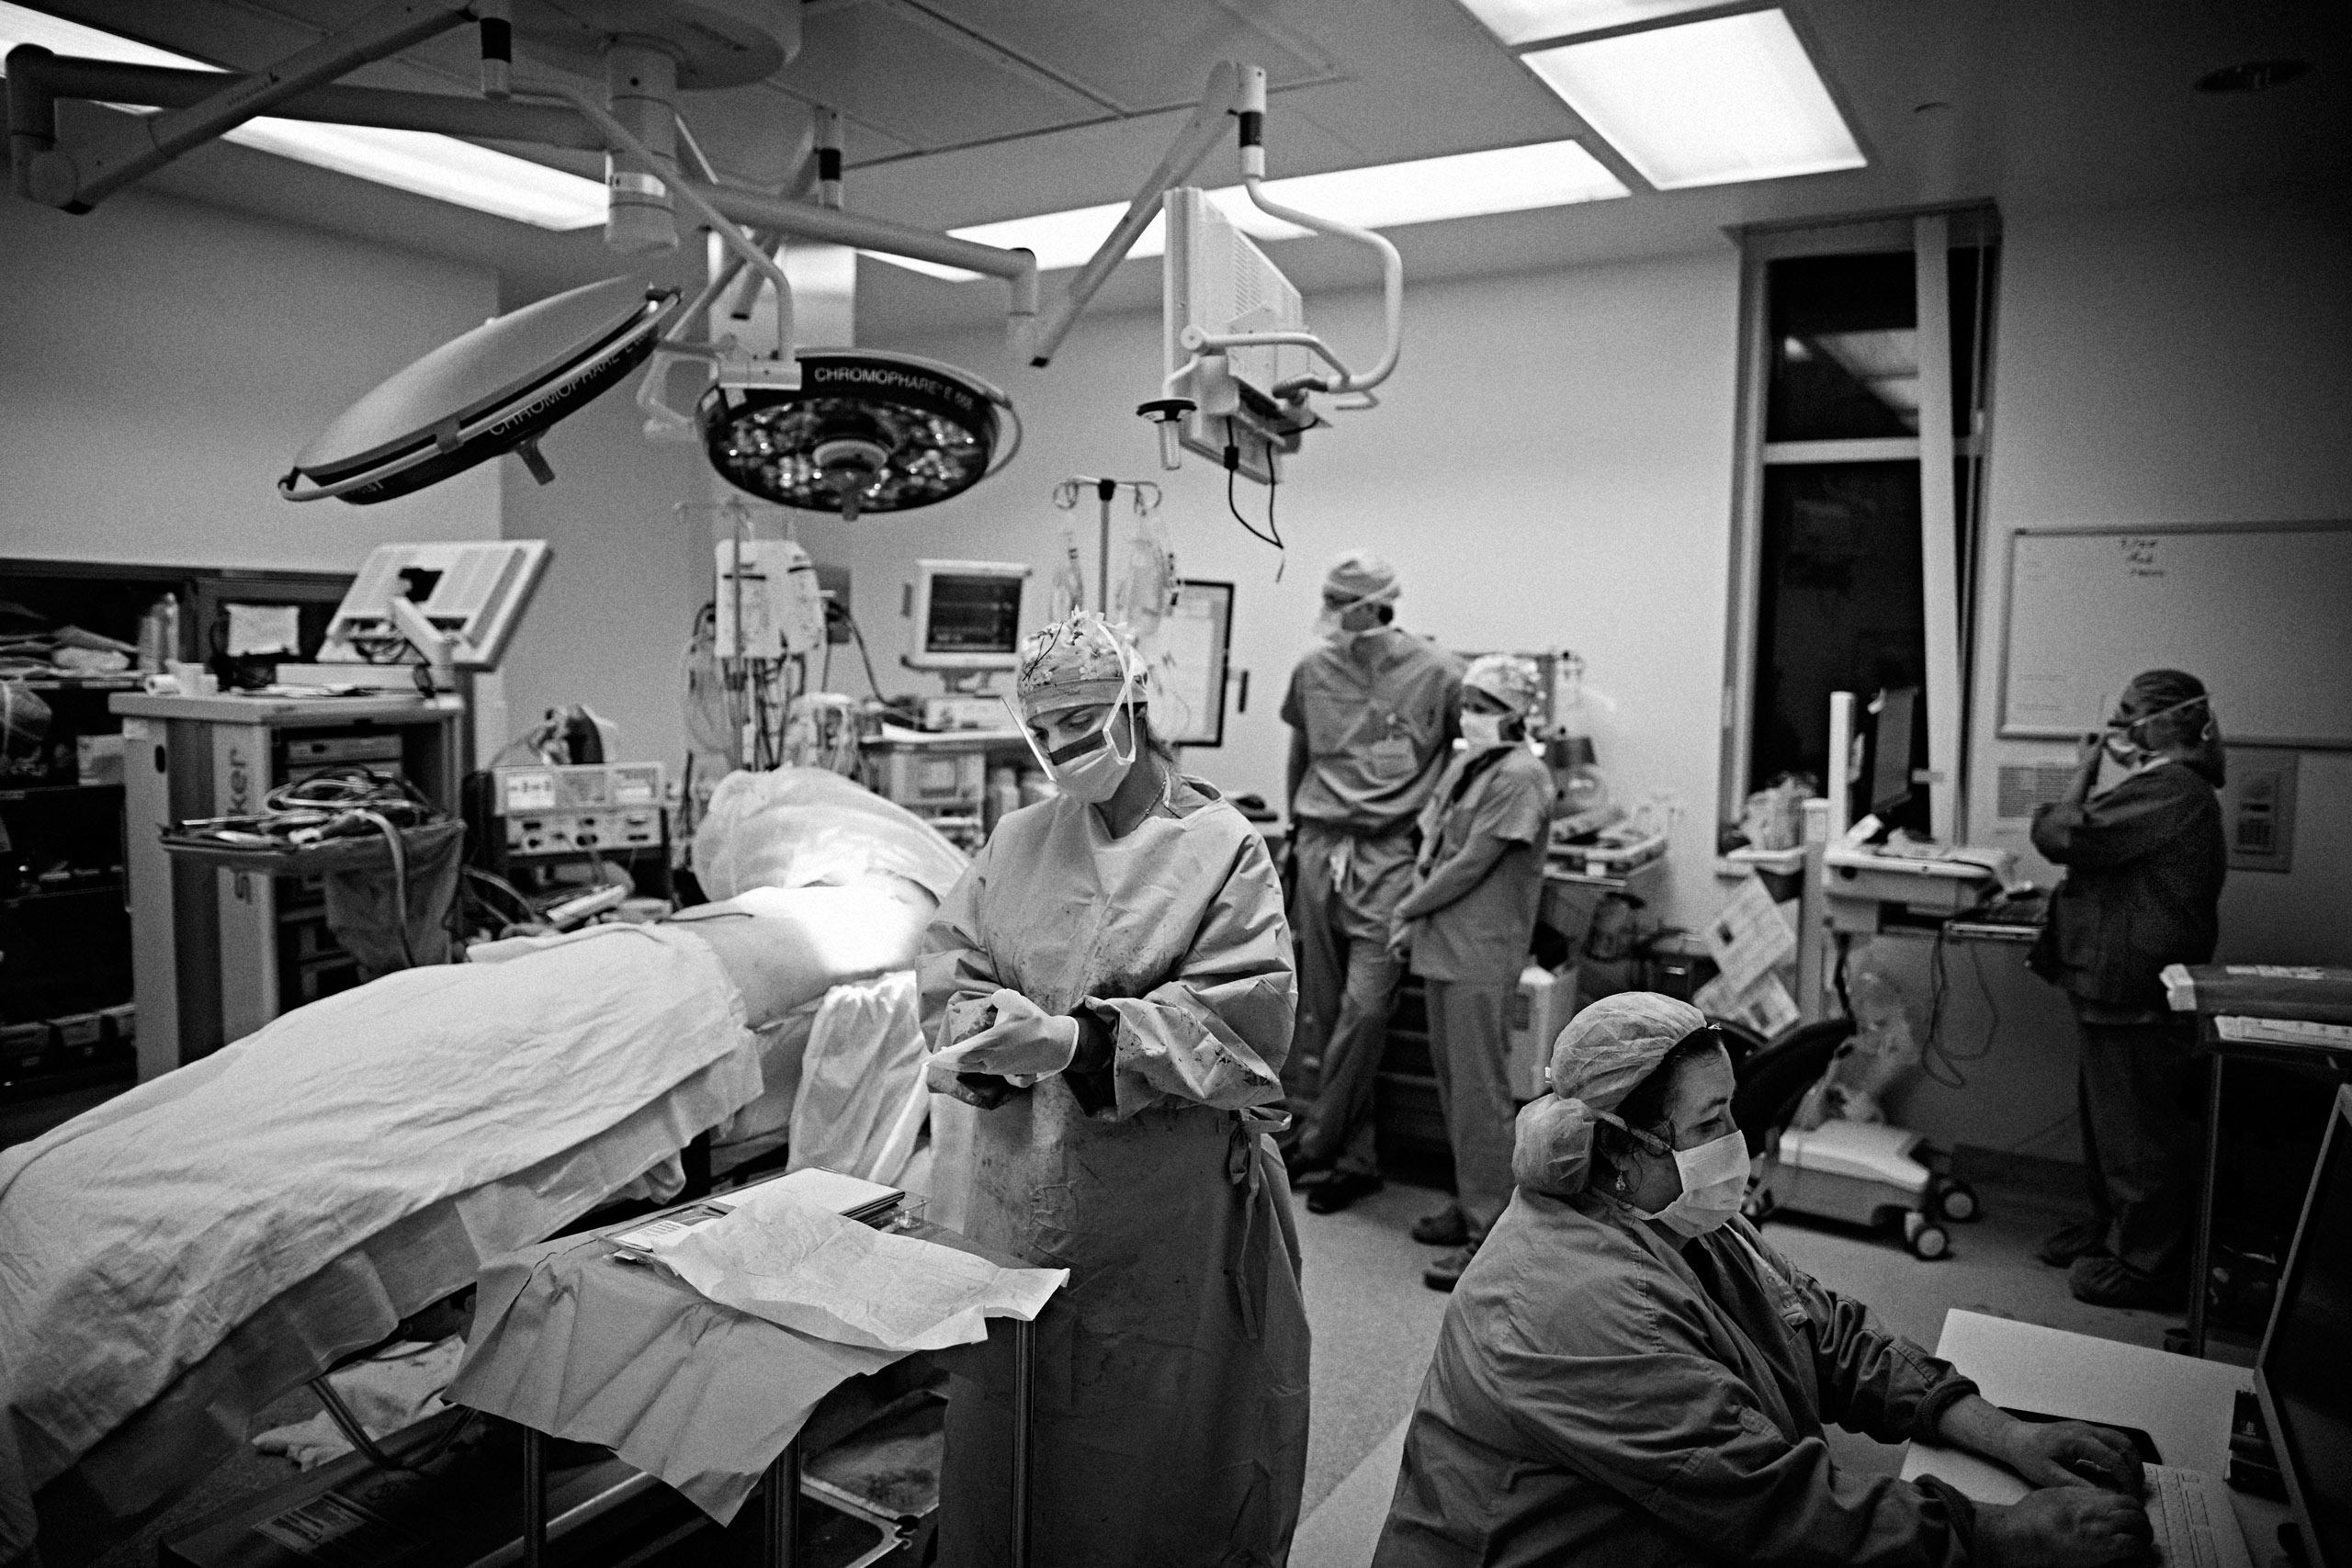 Dr. Salles in the operating room rotation at Santa Clara Valley Medical Center in San Jose, California. March 27, 2015.